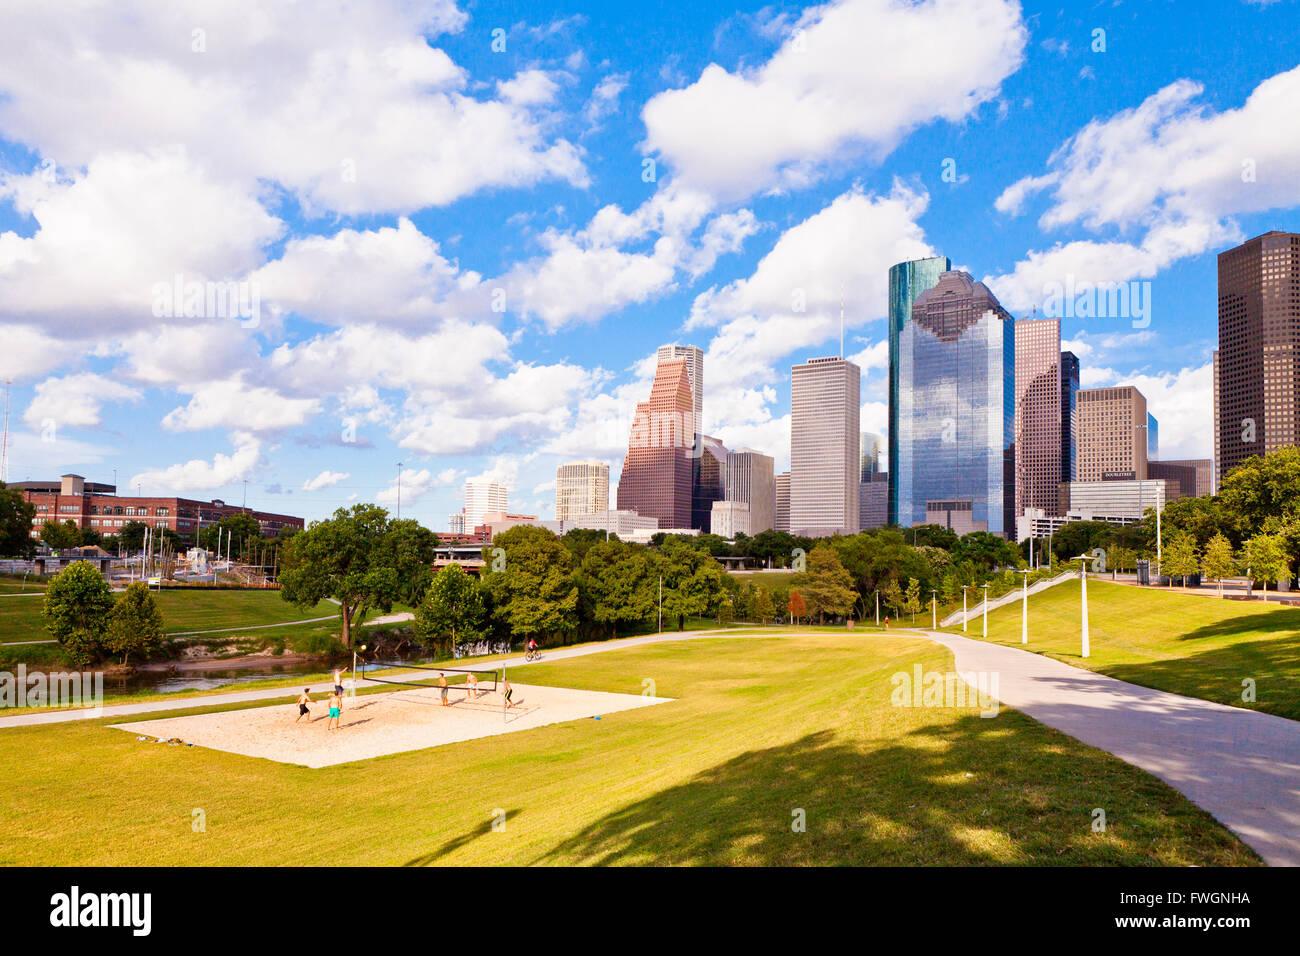 Eleanor Tinsley Park, Houston, Texas, United States of America, North America - Stock Image